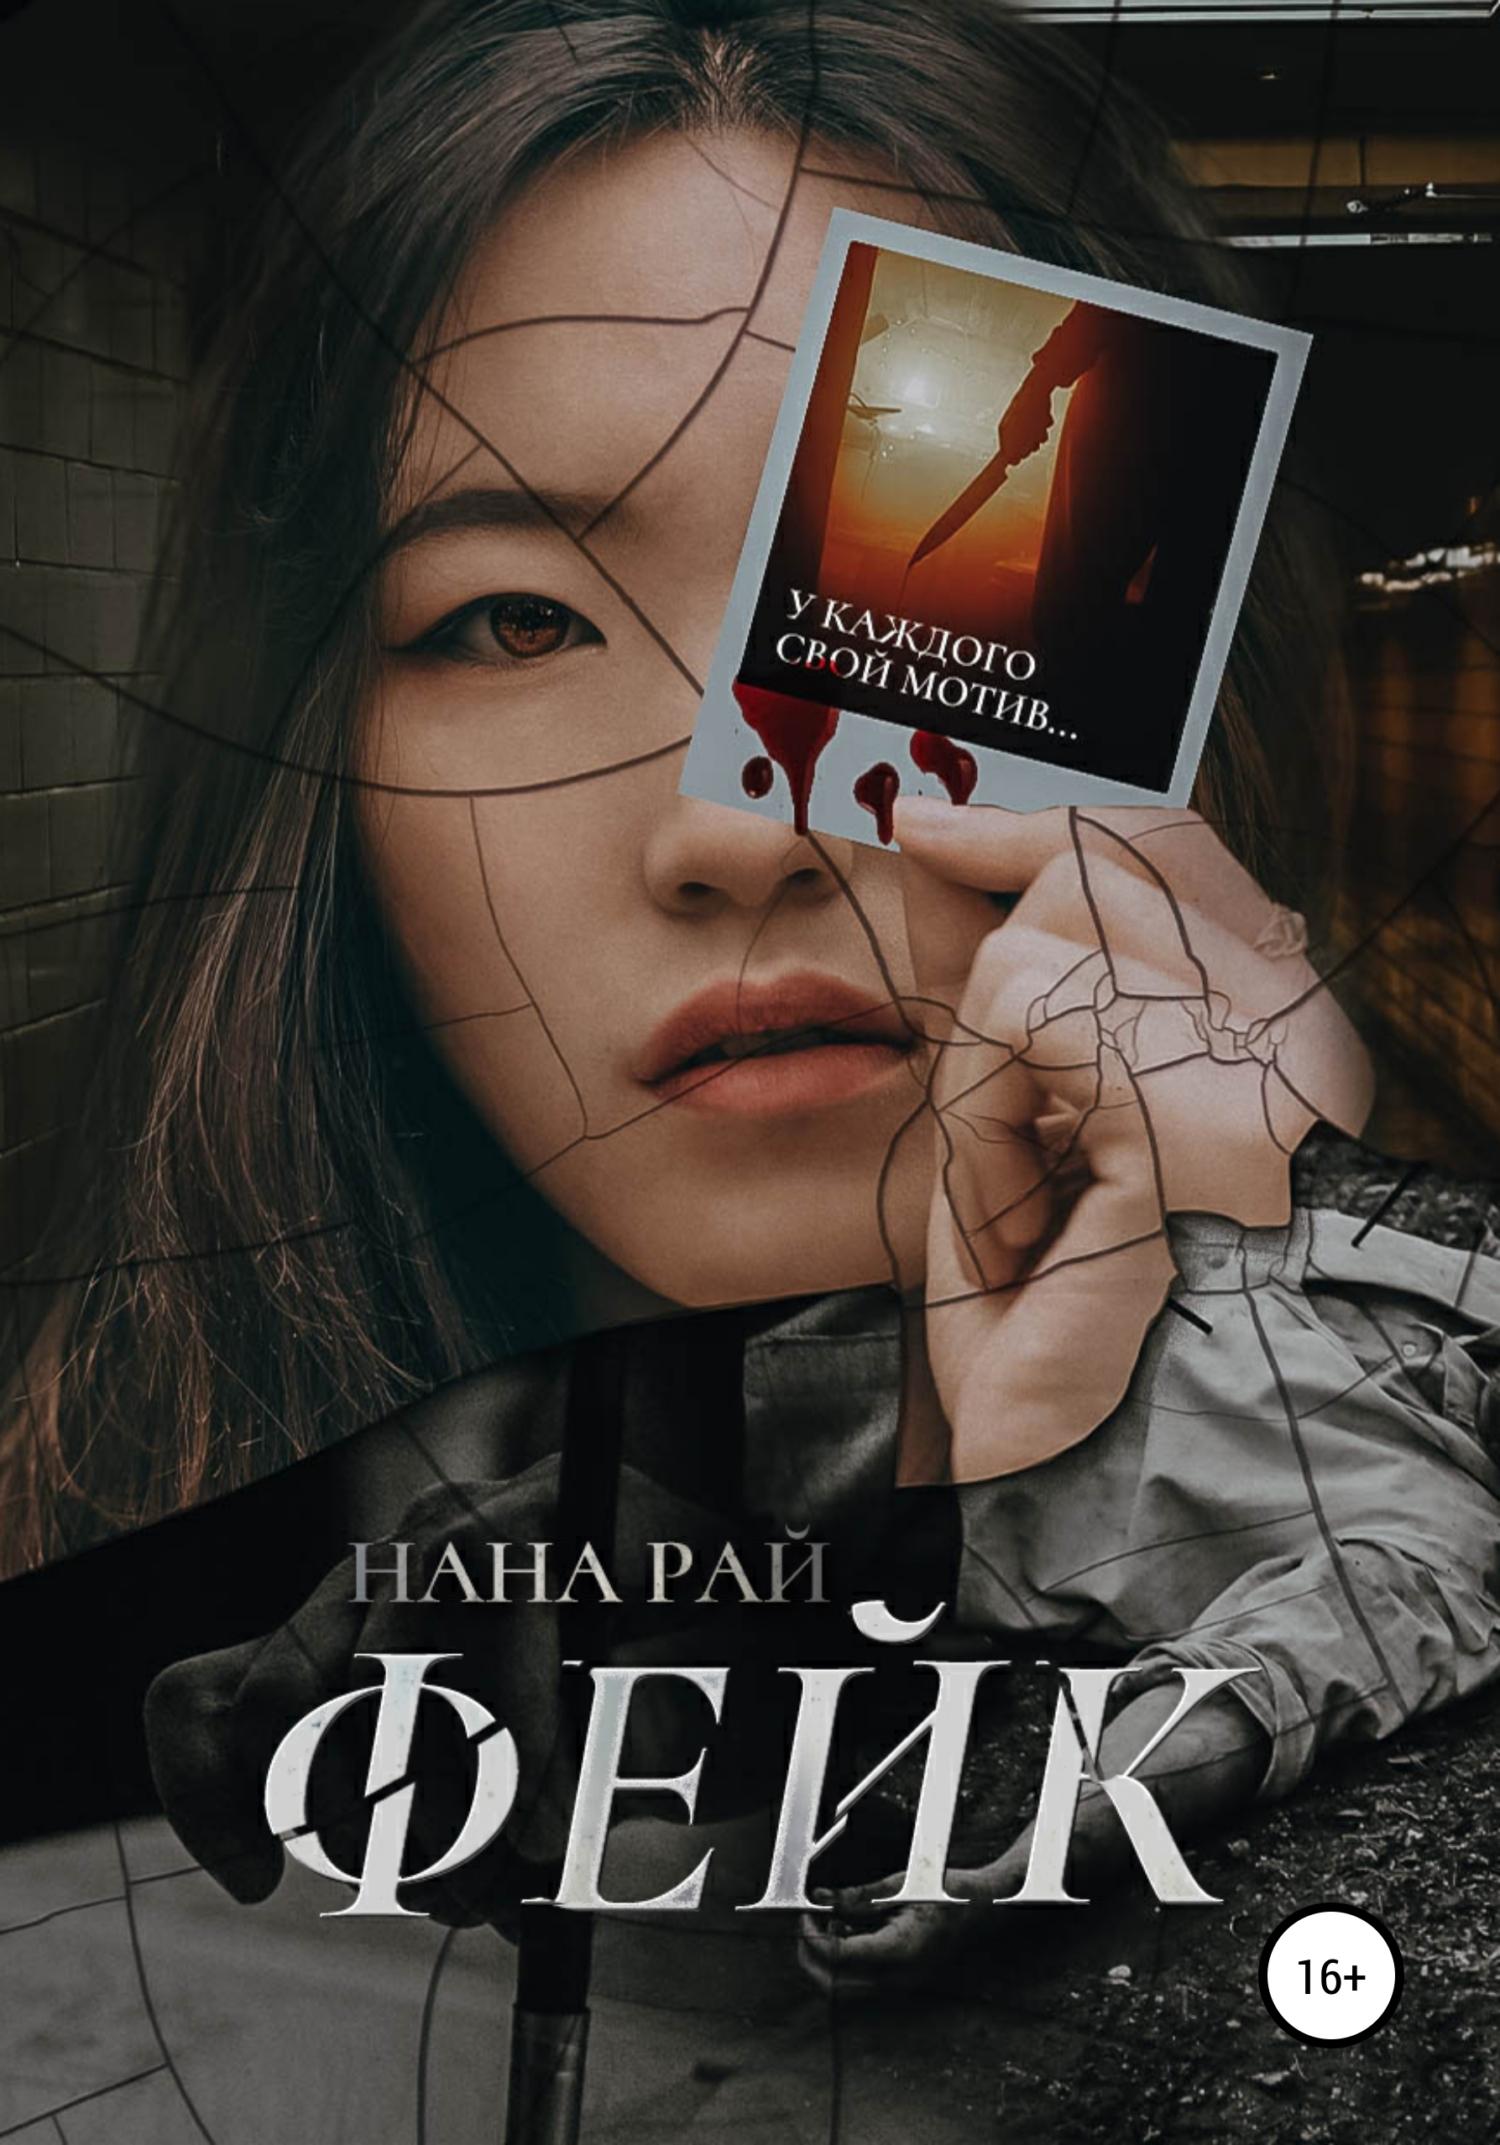 Анастасия Сергеевна Румянцева Фейк